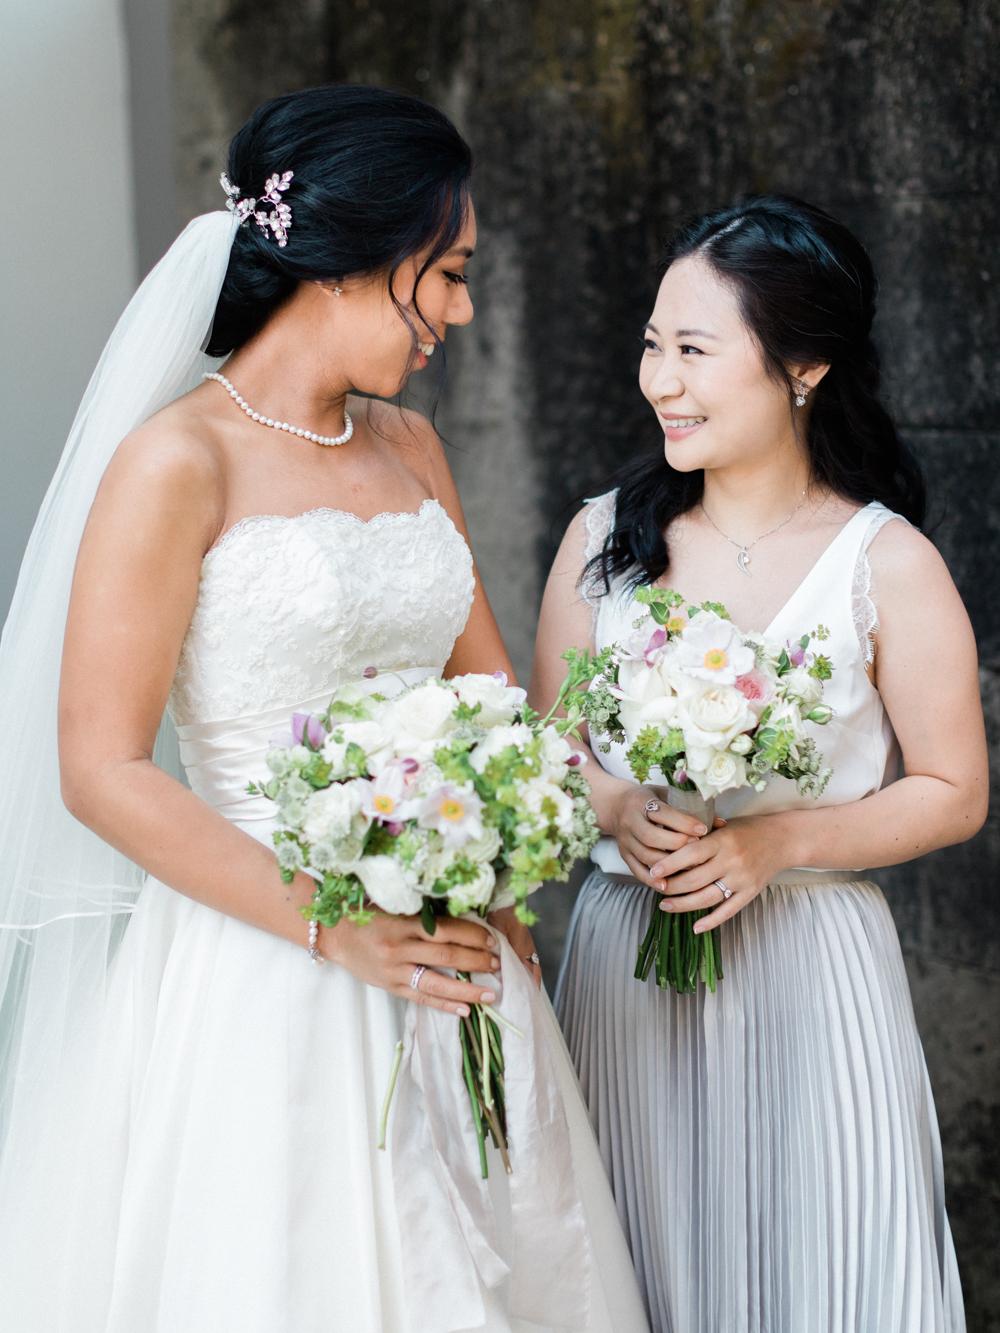 Bali_Real_Wedding_(c)_Rory_Wylie-46.jpg